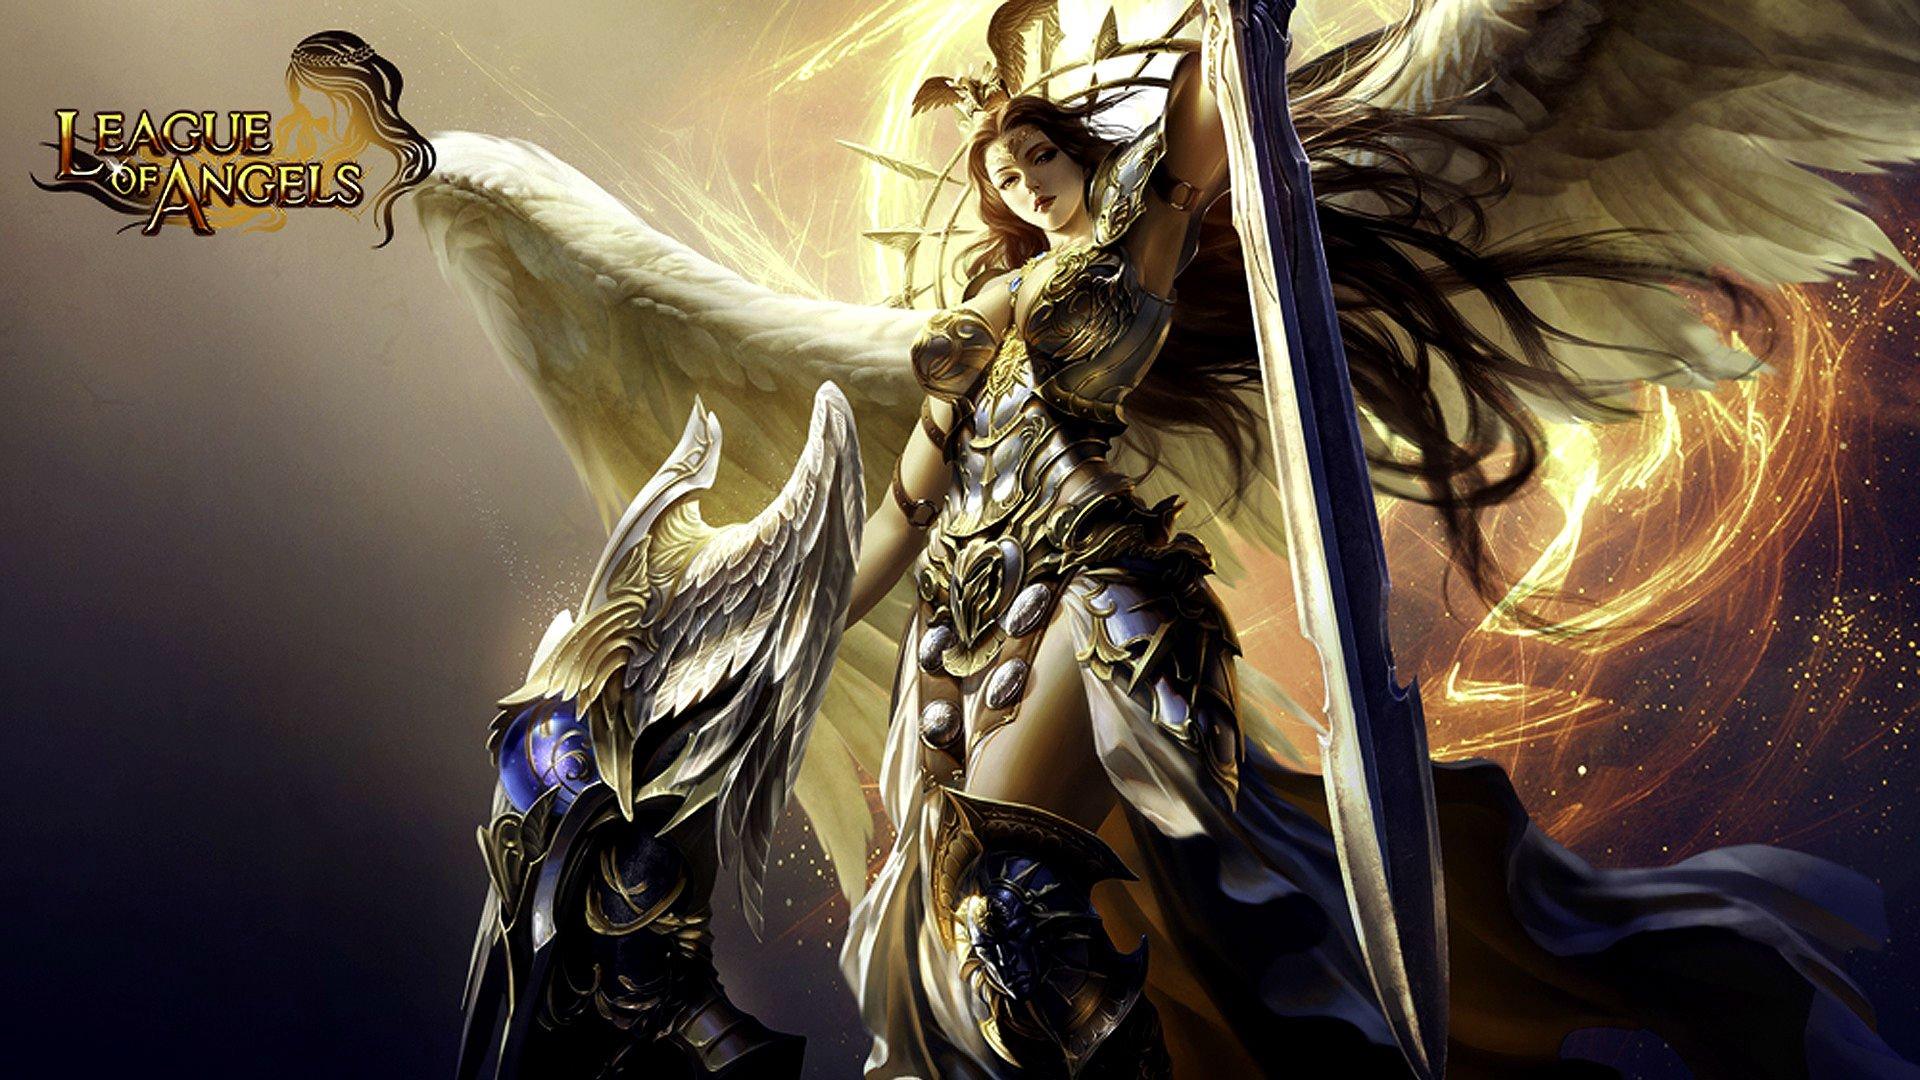 45 league of angels wallpaper on wallpapersafari